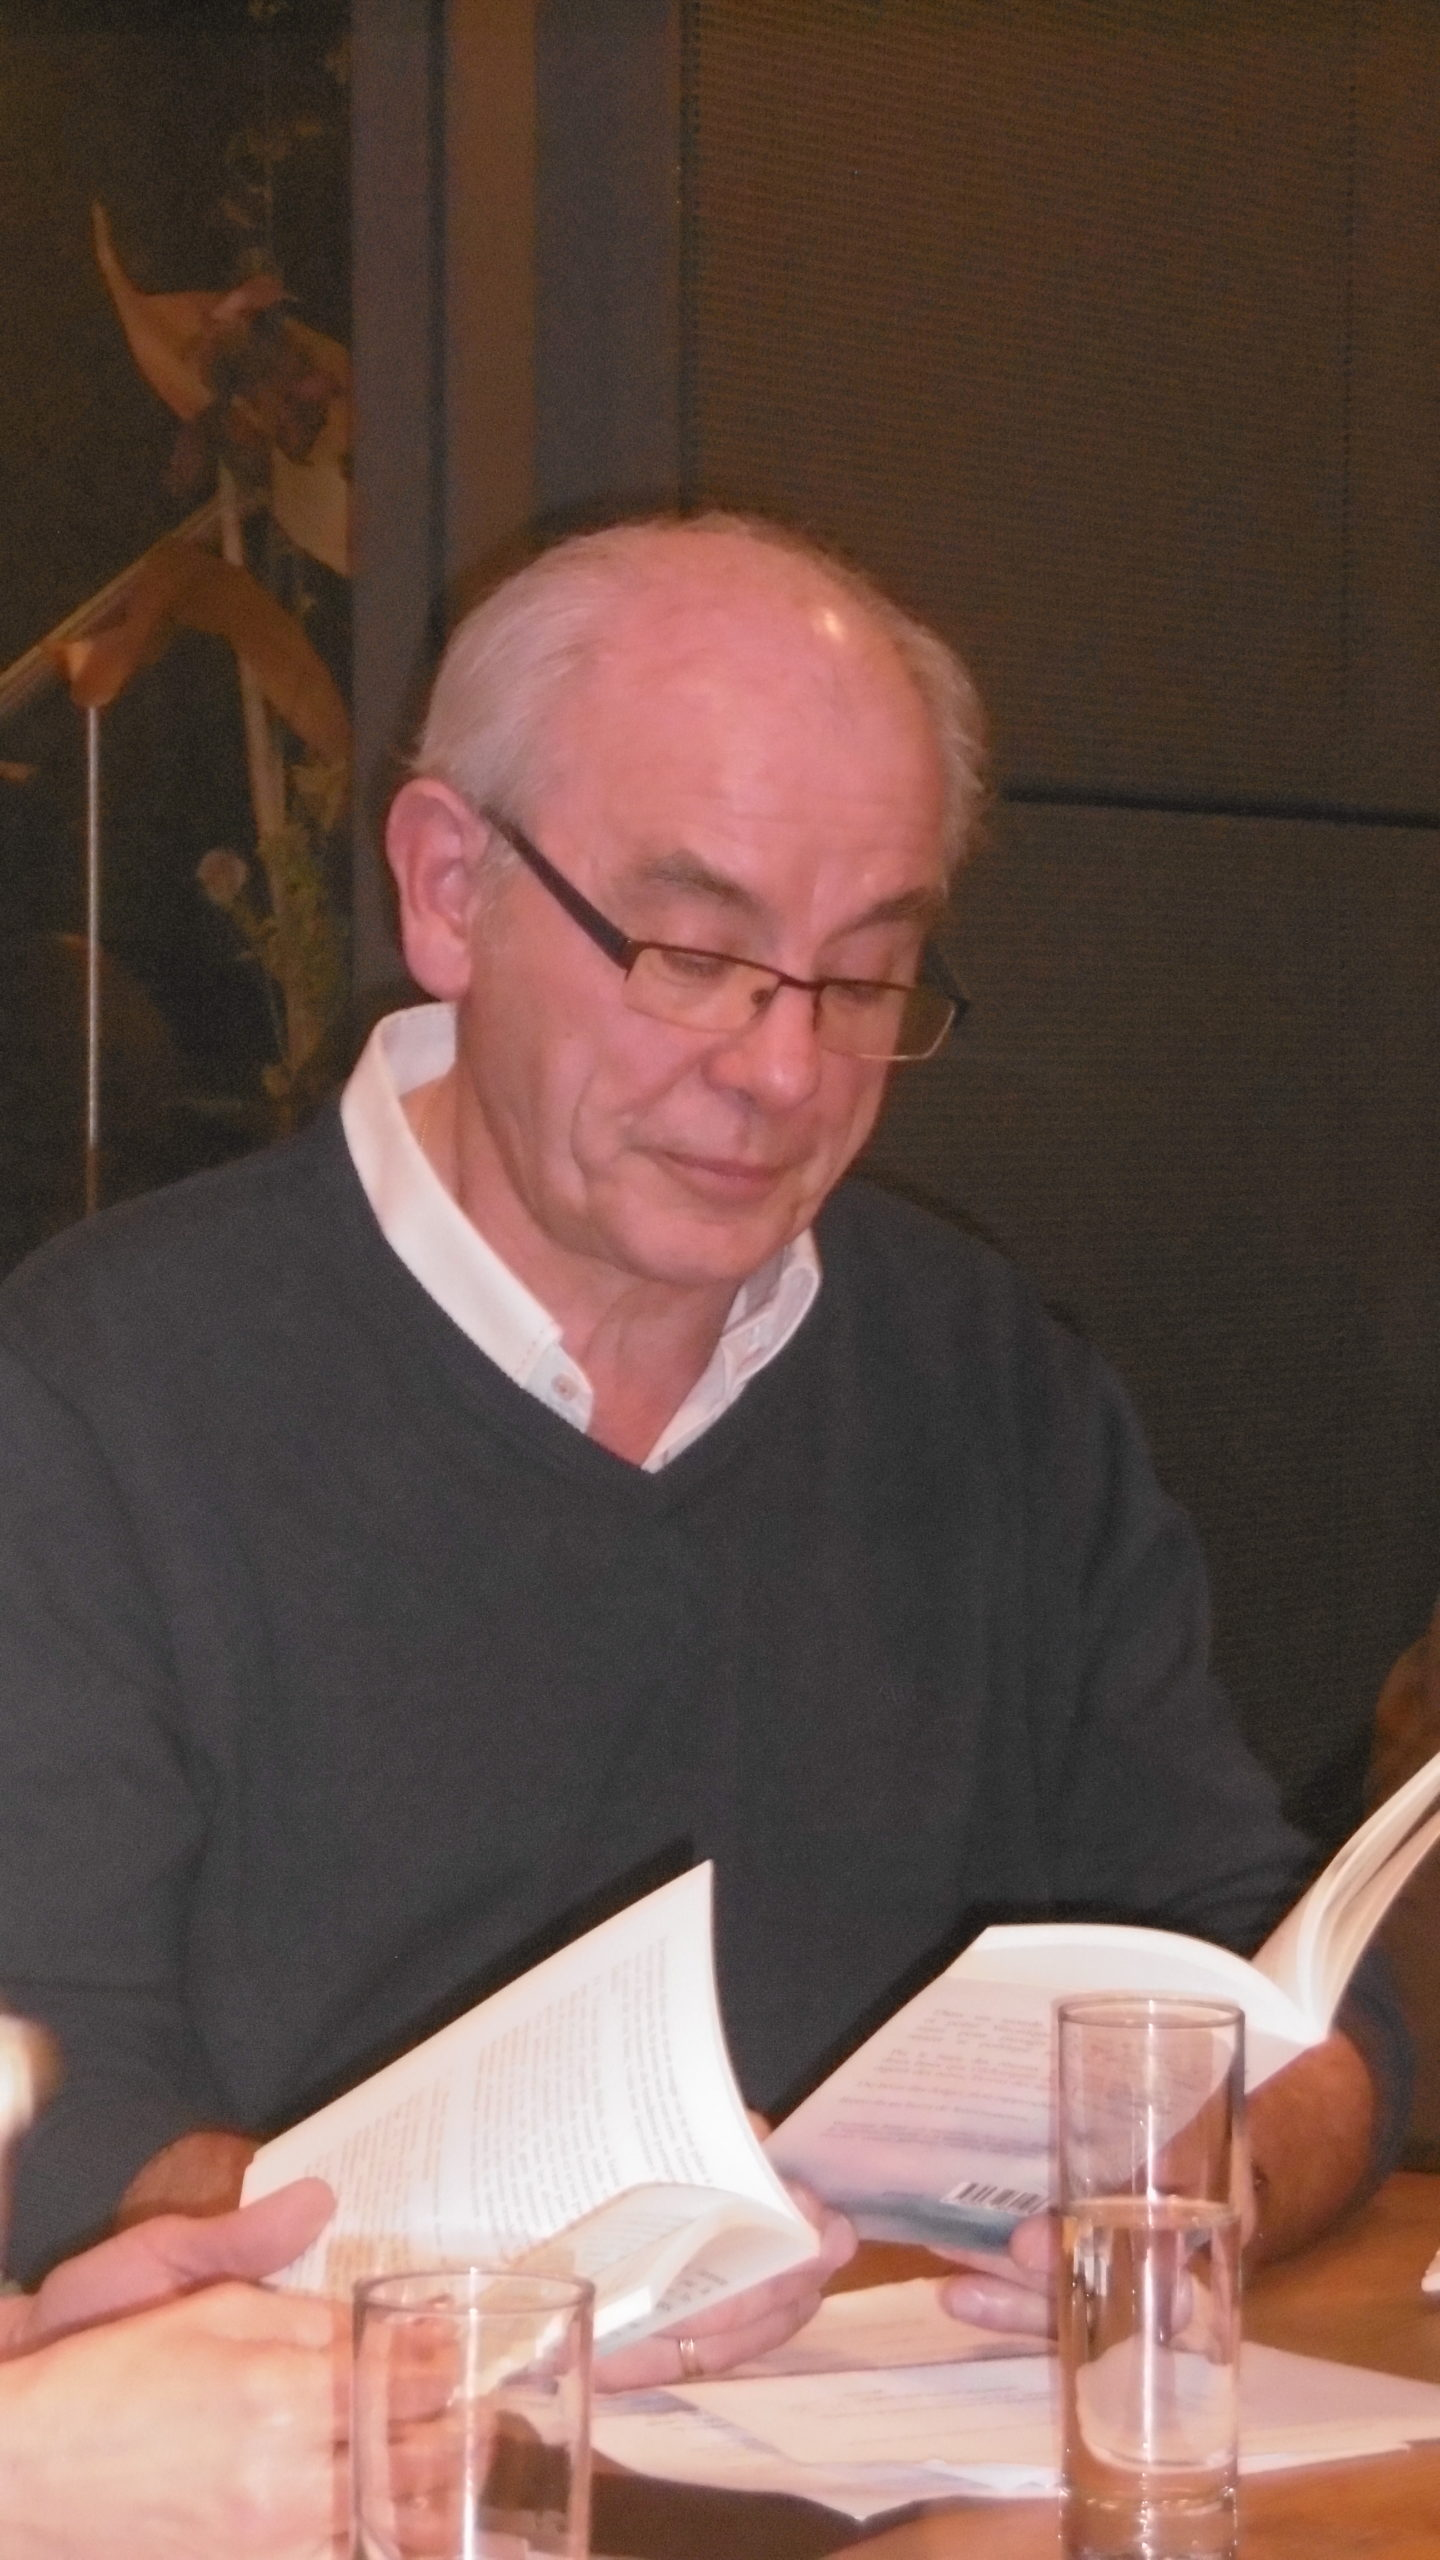 Patrick Devaux